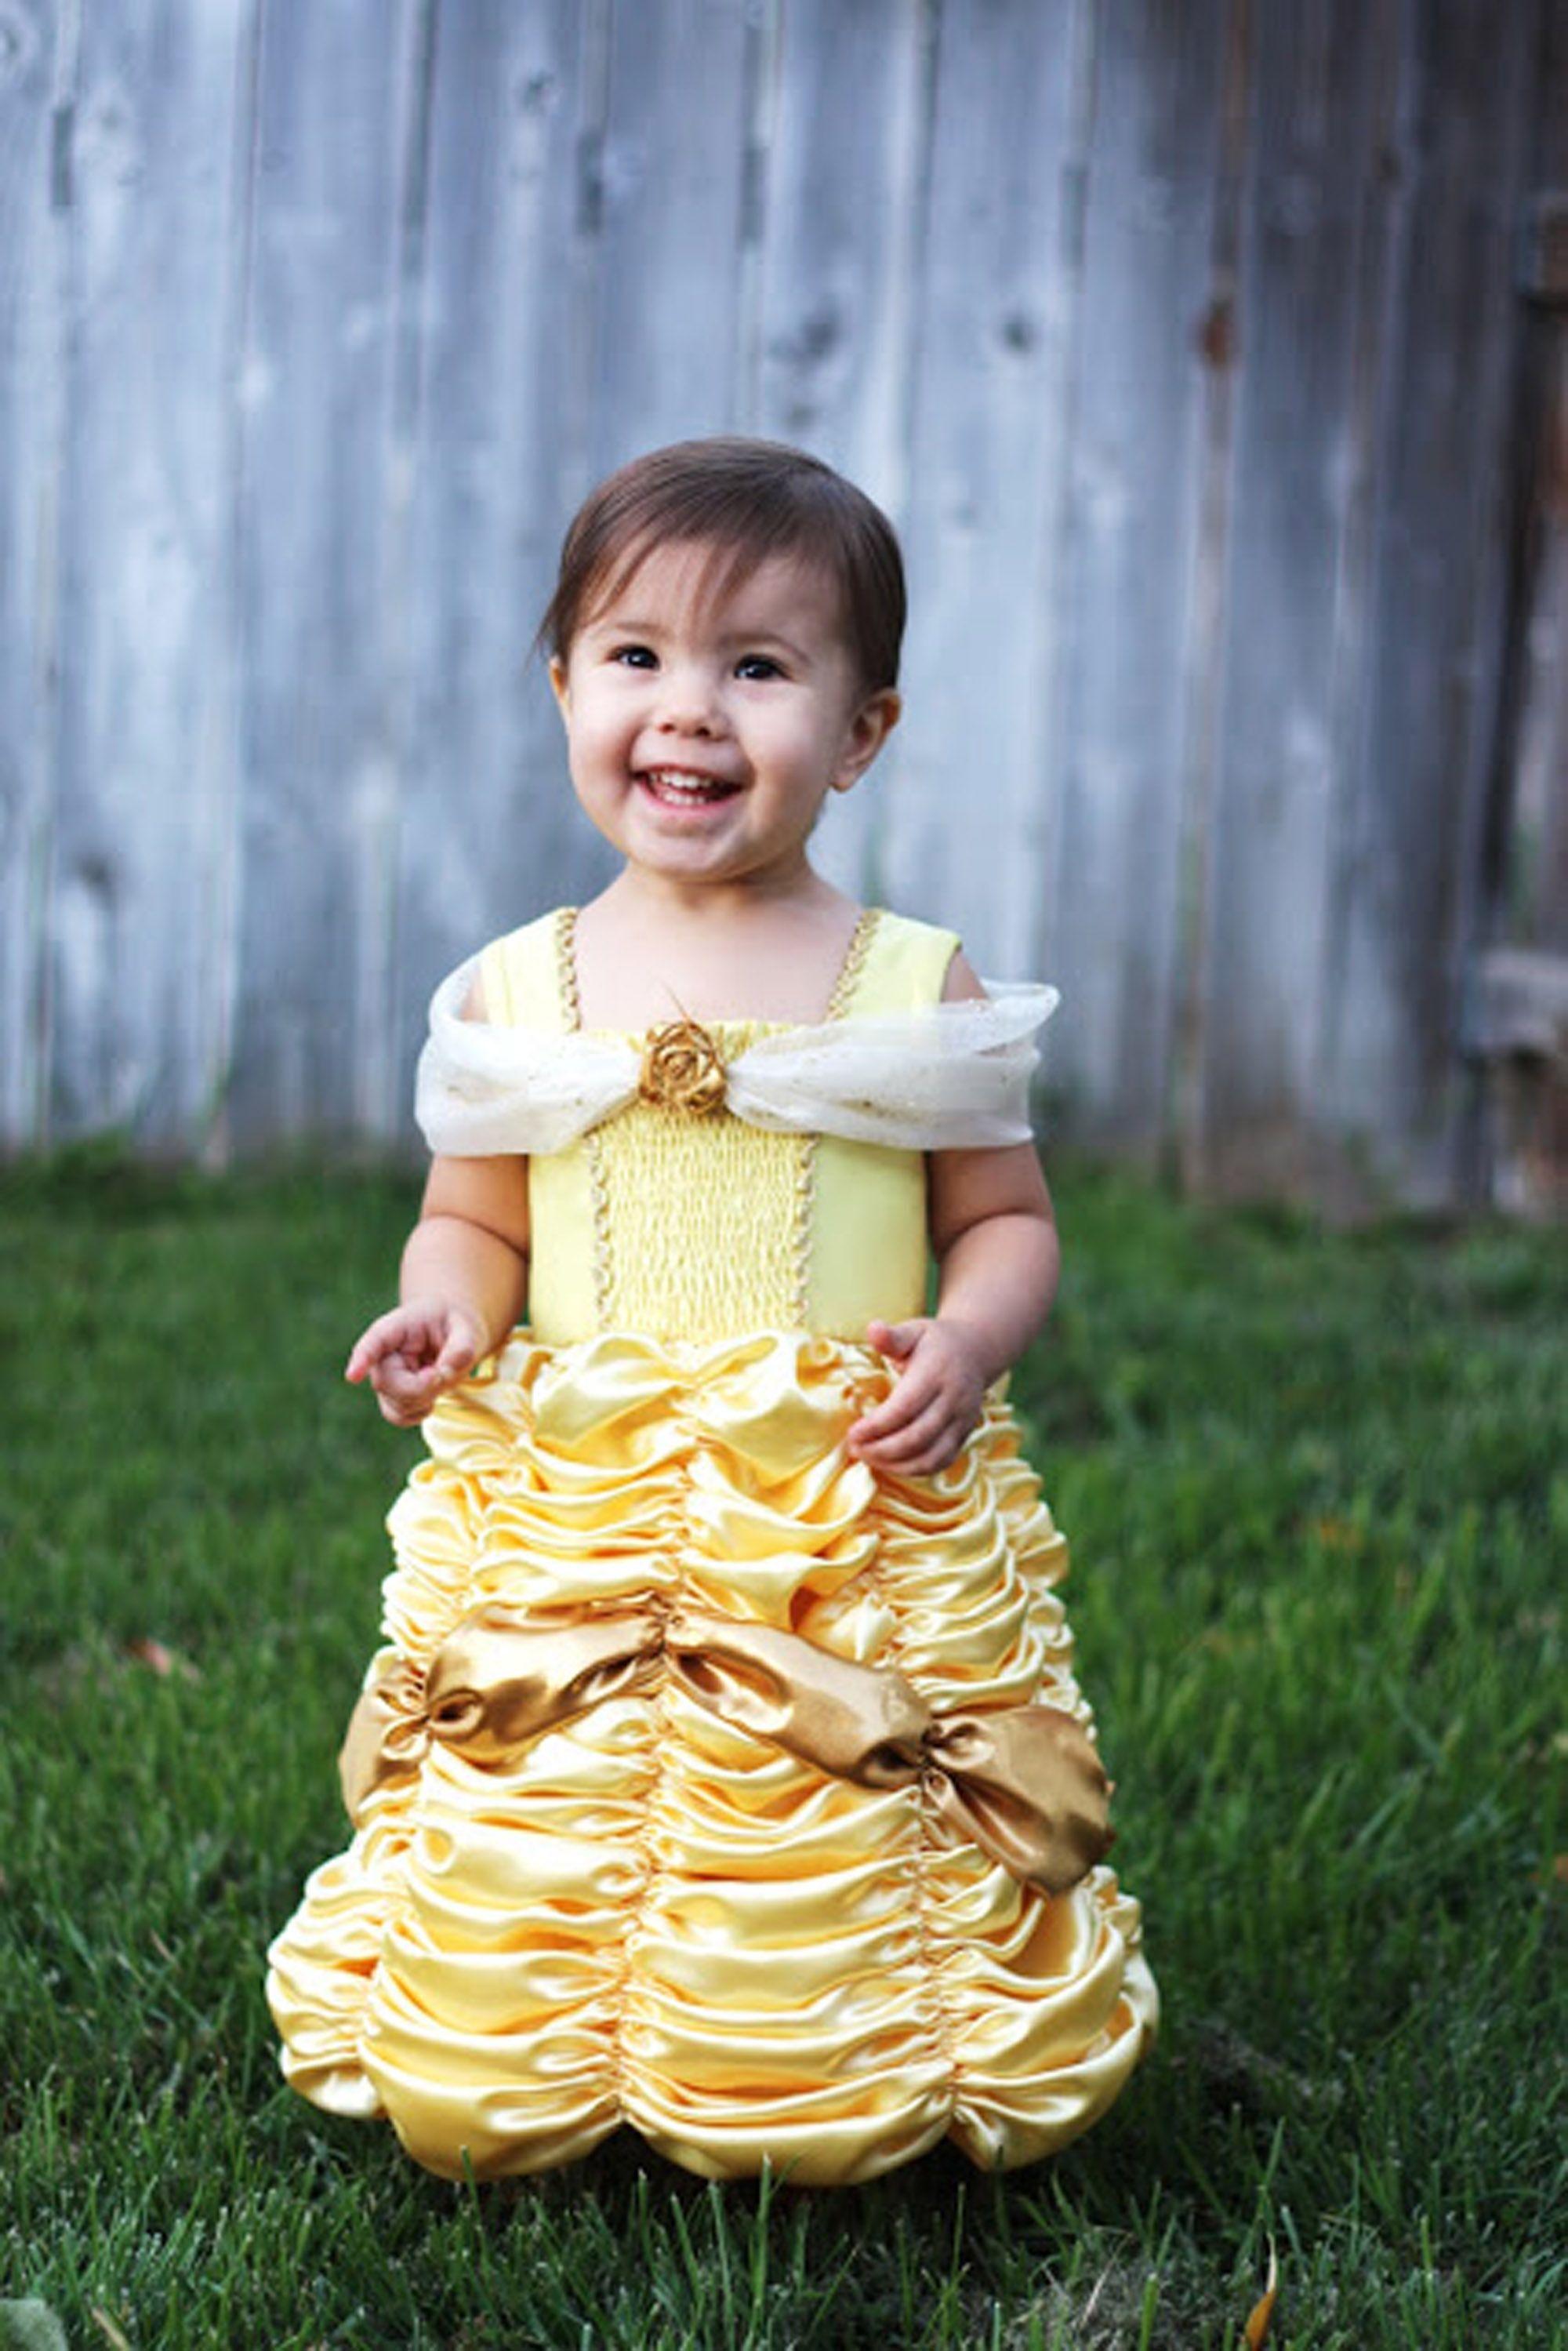 princess costumes diy belle toddler  sc 1 st  Country Living Magazine & 20 DIY Disney Princess Costumes - Homemade Princess Dresses for Kids